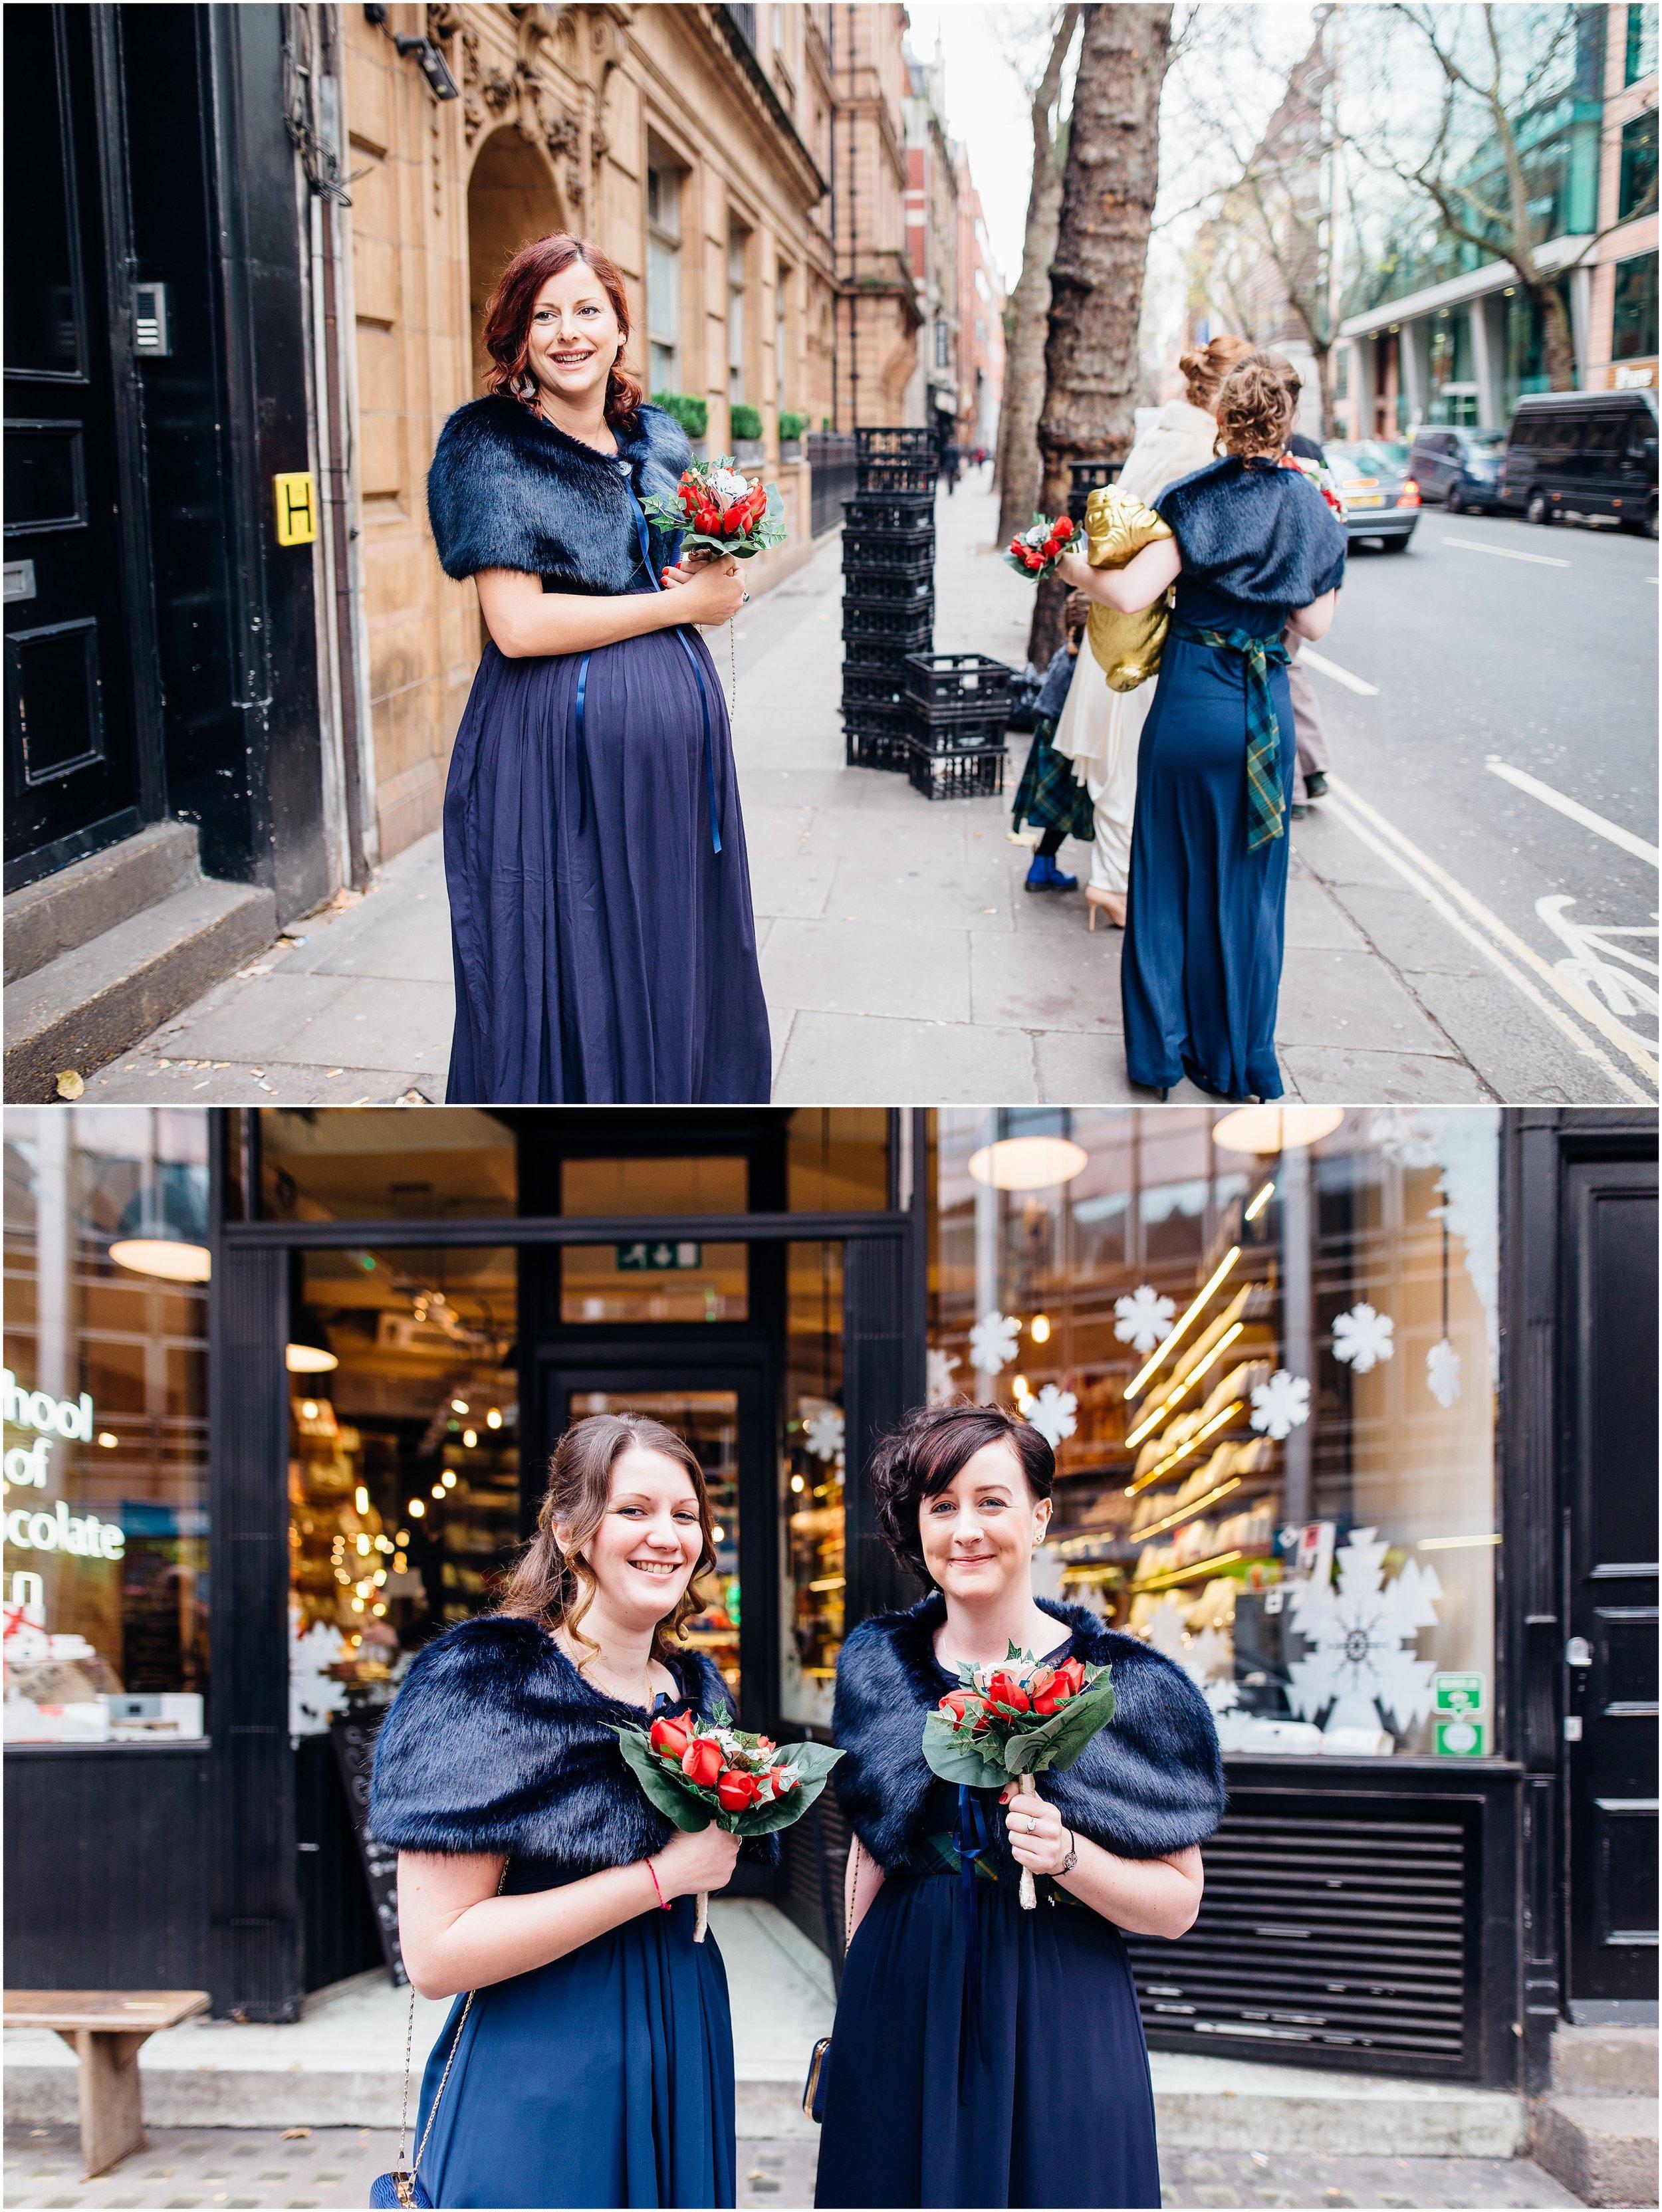 Bloomsbury Bowling london wedding photographer_0022.jpg